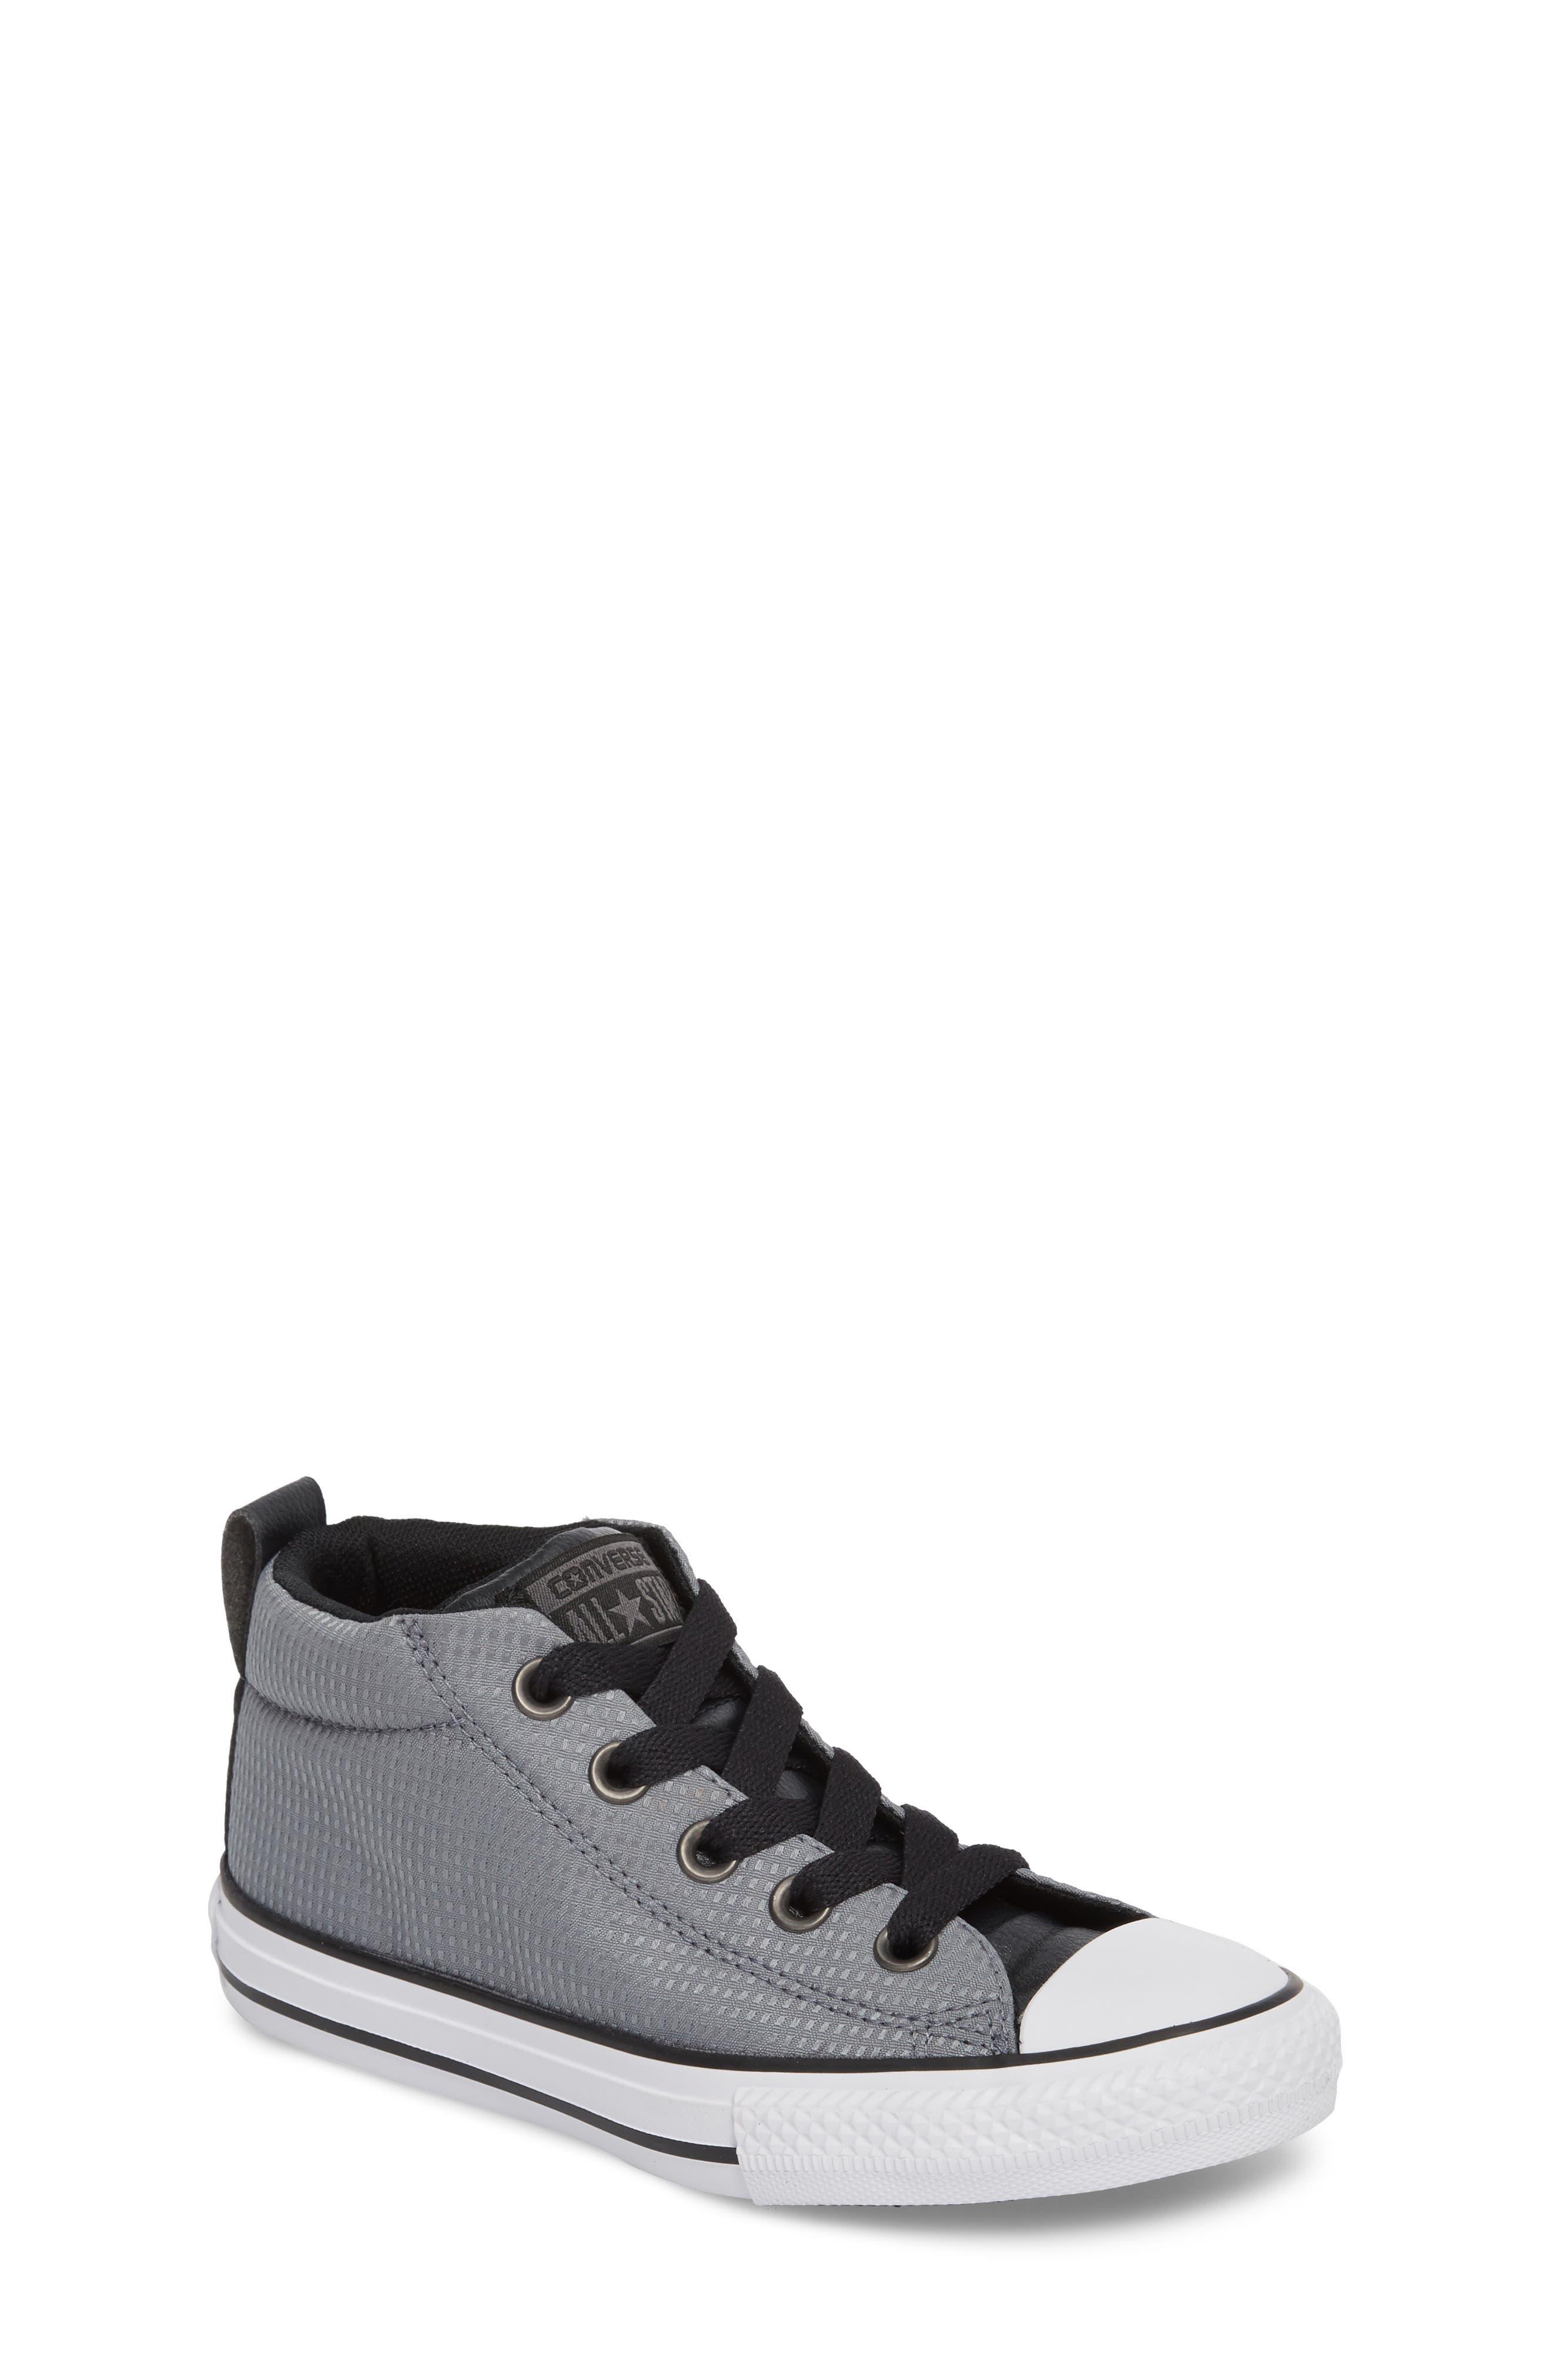 Main Image - Converse Chuck Taylor® All Star® Street Mid Backpack Sneaker (Baby, Walker, Toddler, Little Kid & Big Kid)